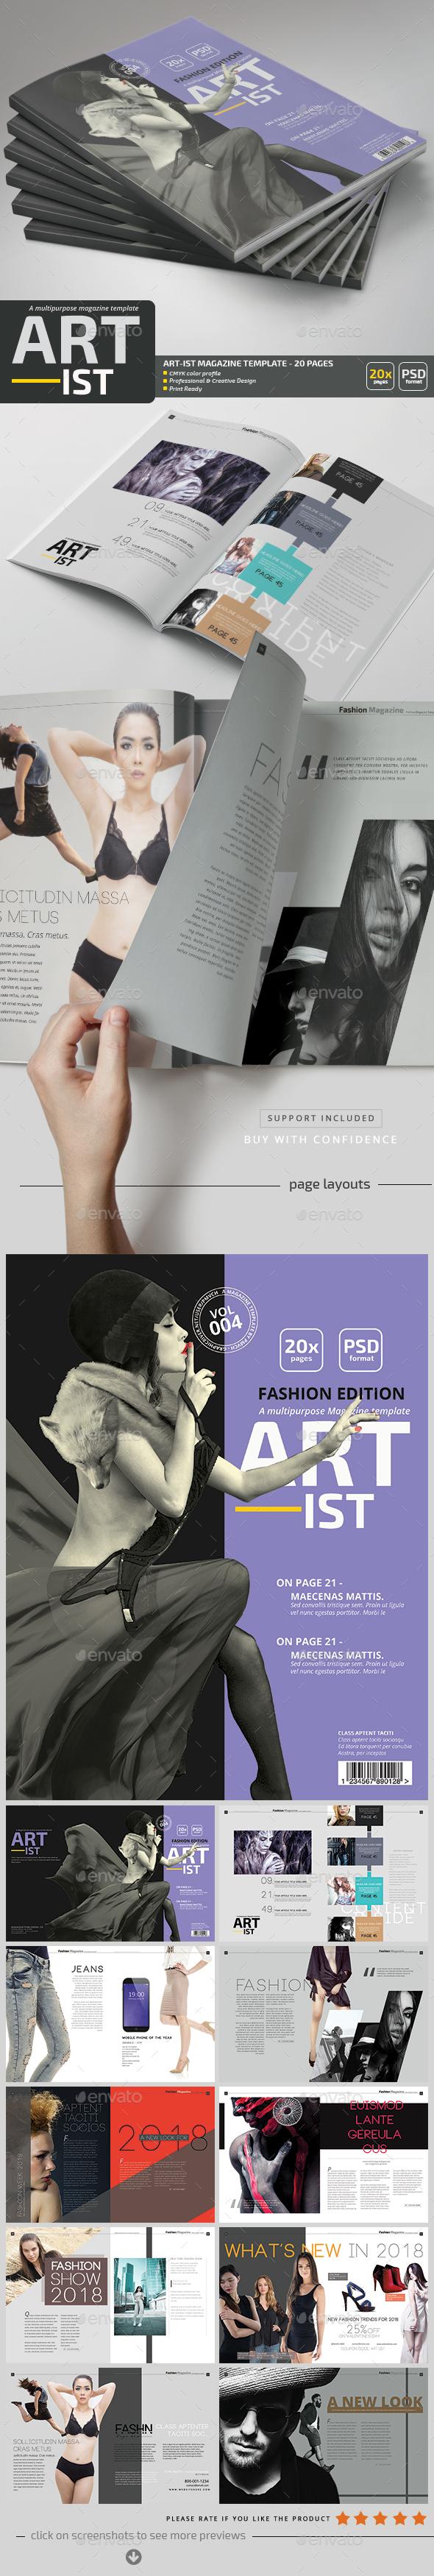 Art-ist Magazine Template V.4 - Magazines Print Templates